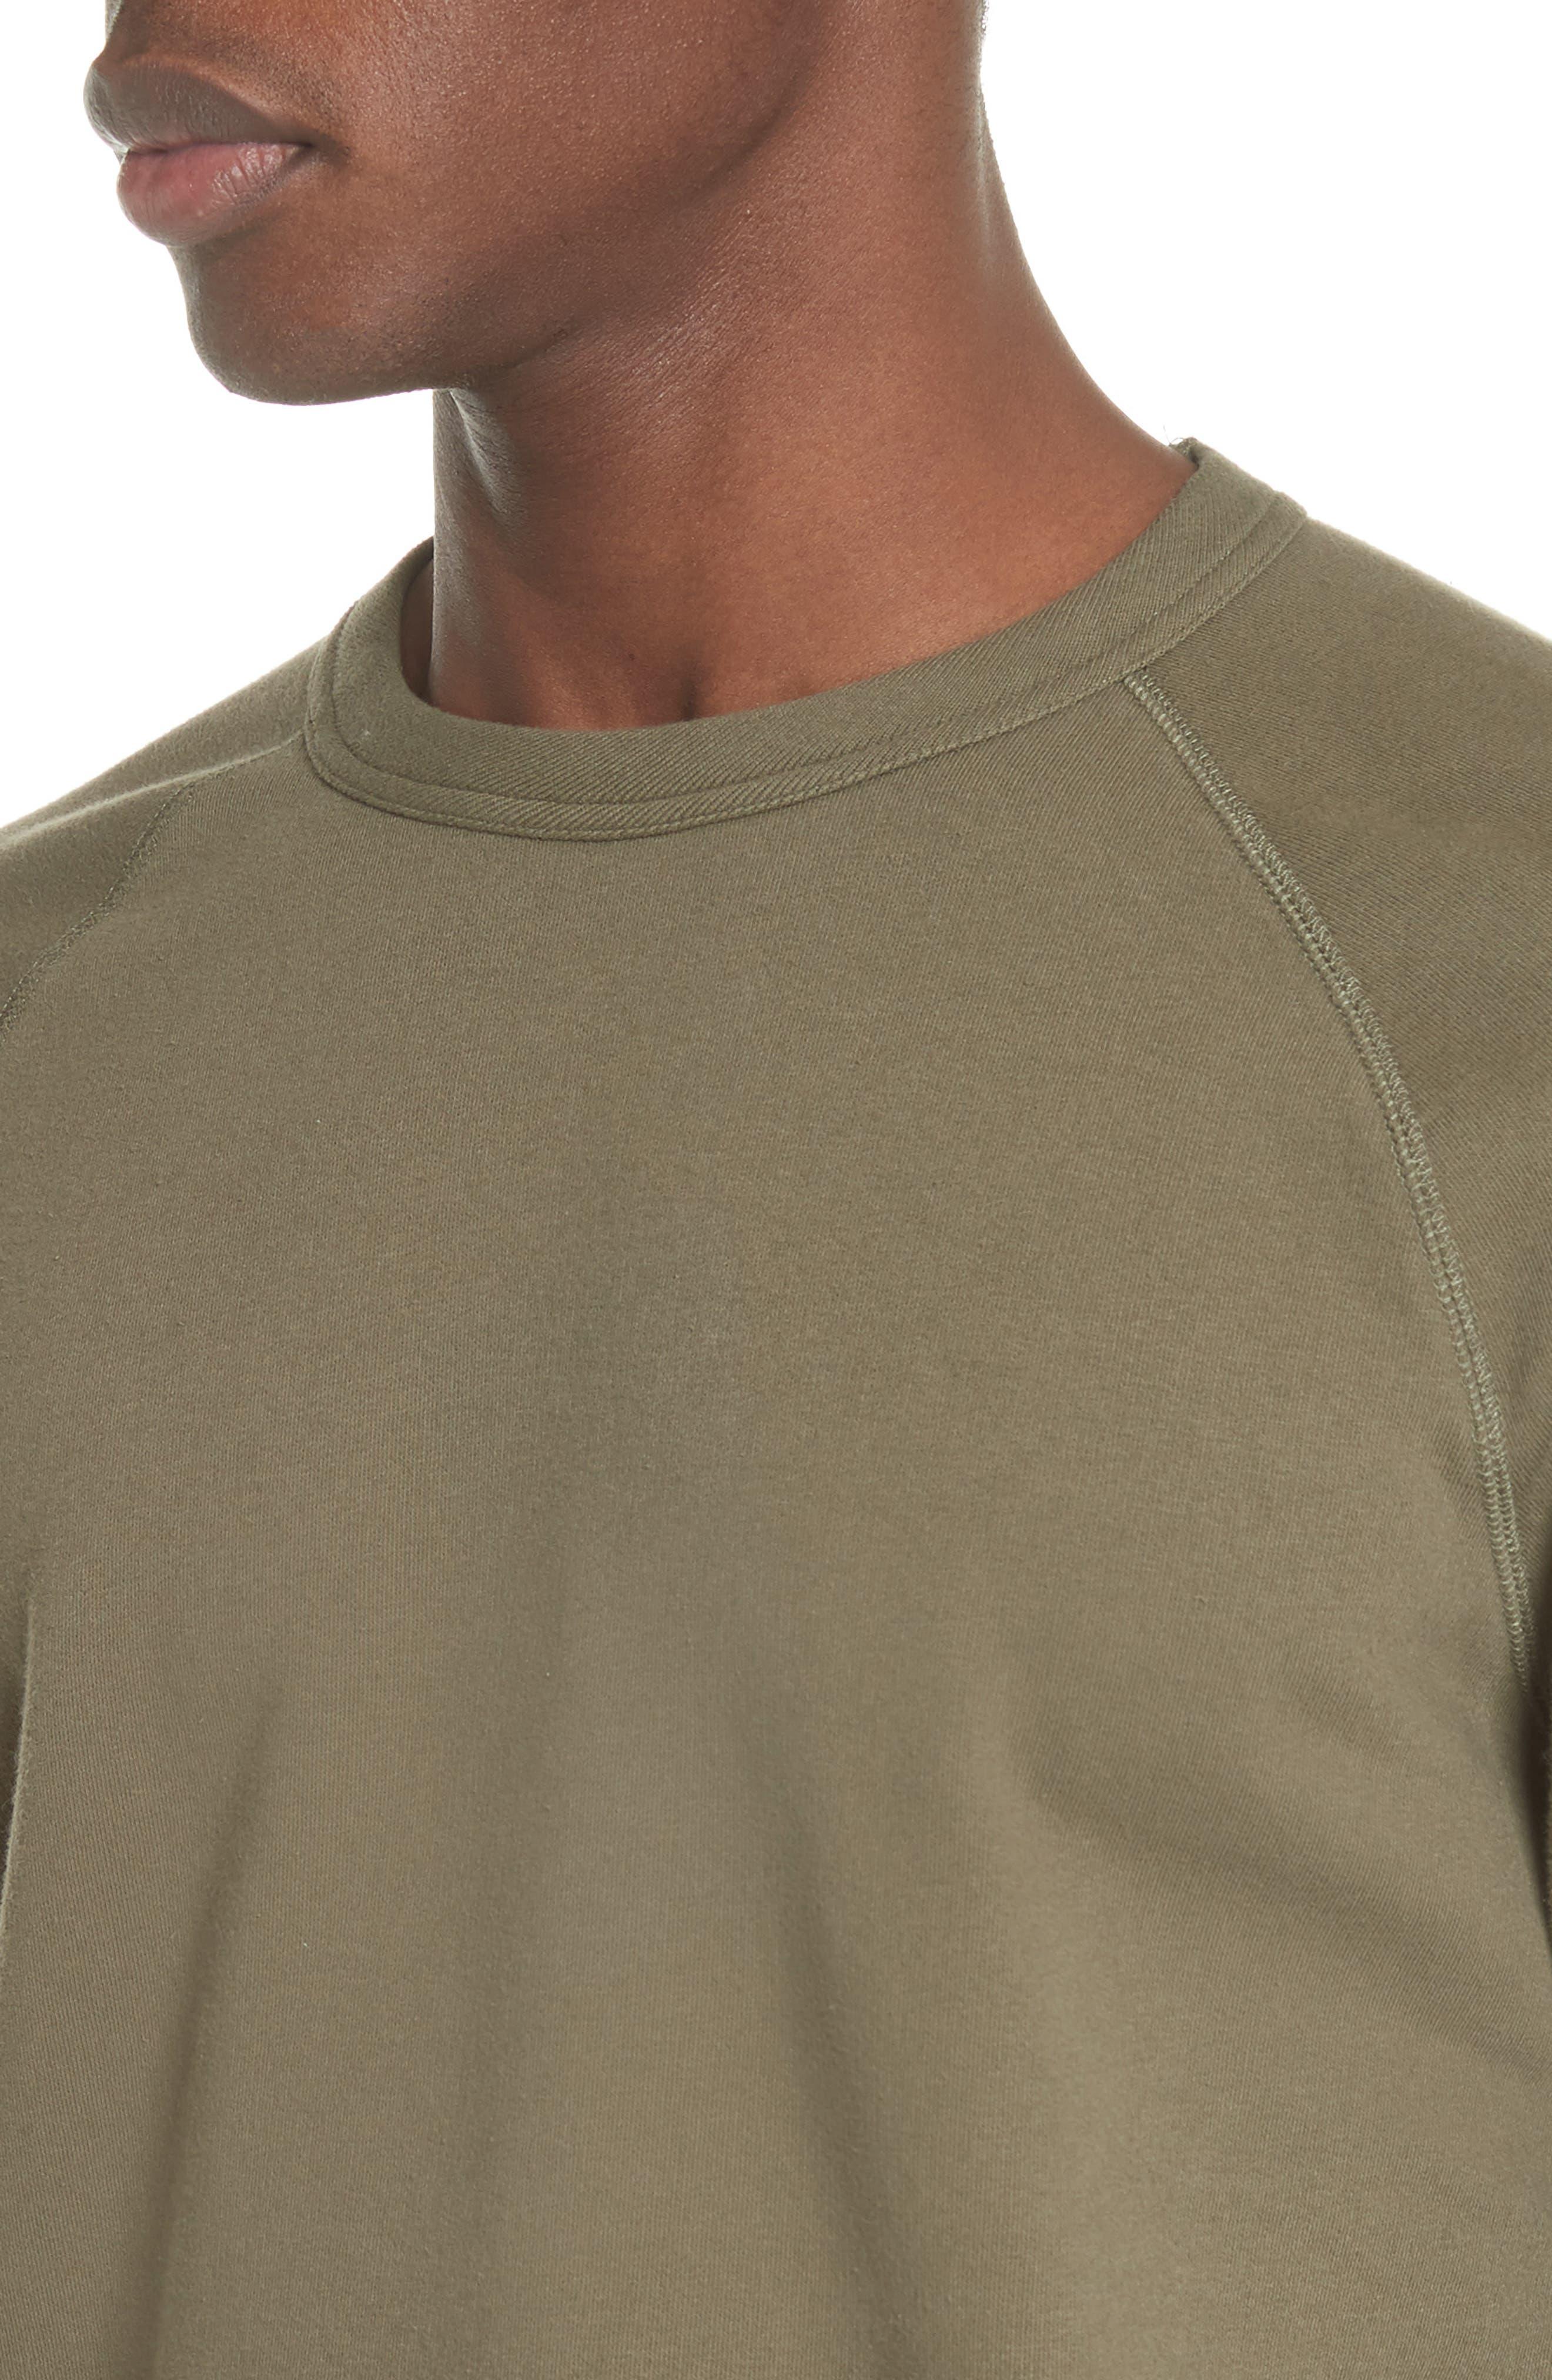 Core Crewneck Sweatshirt,                             Alternate thumbnail 4, color,                             301